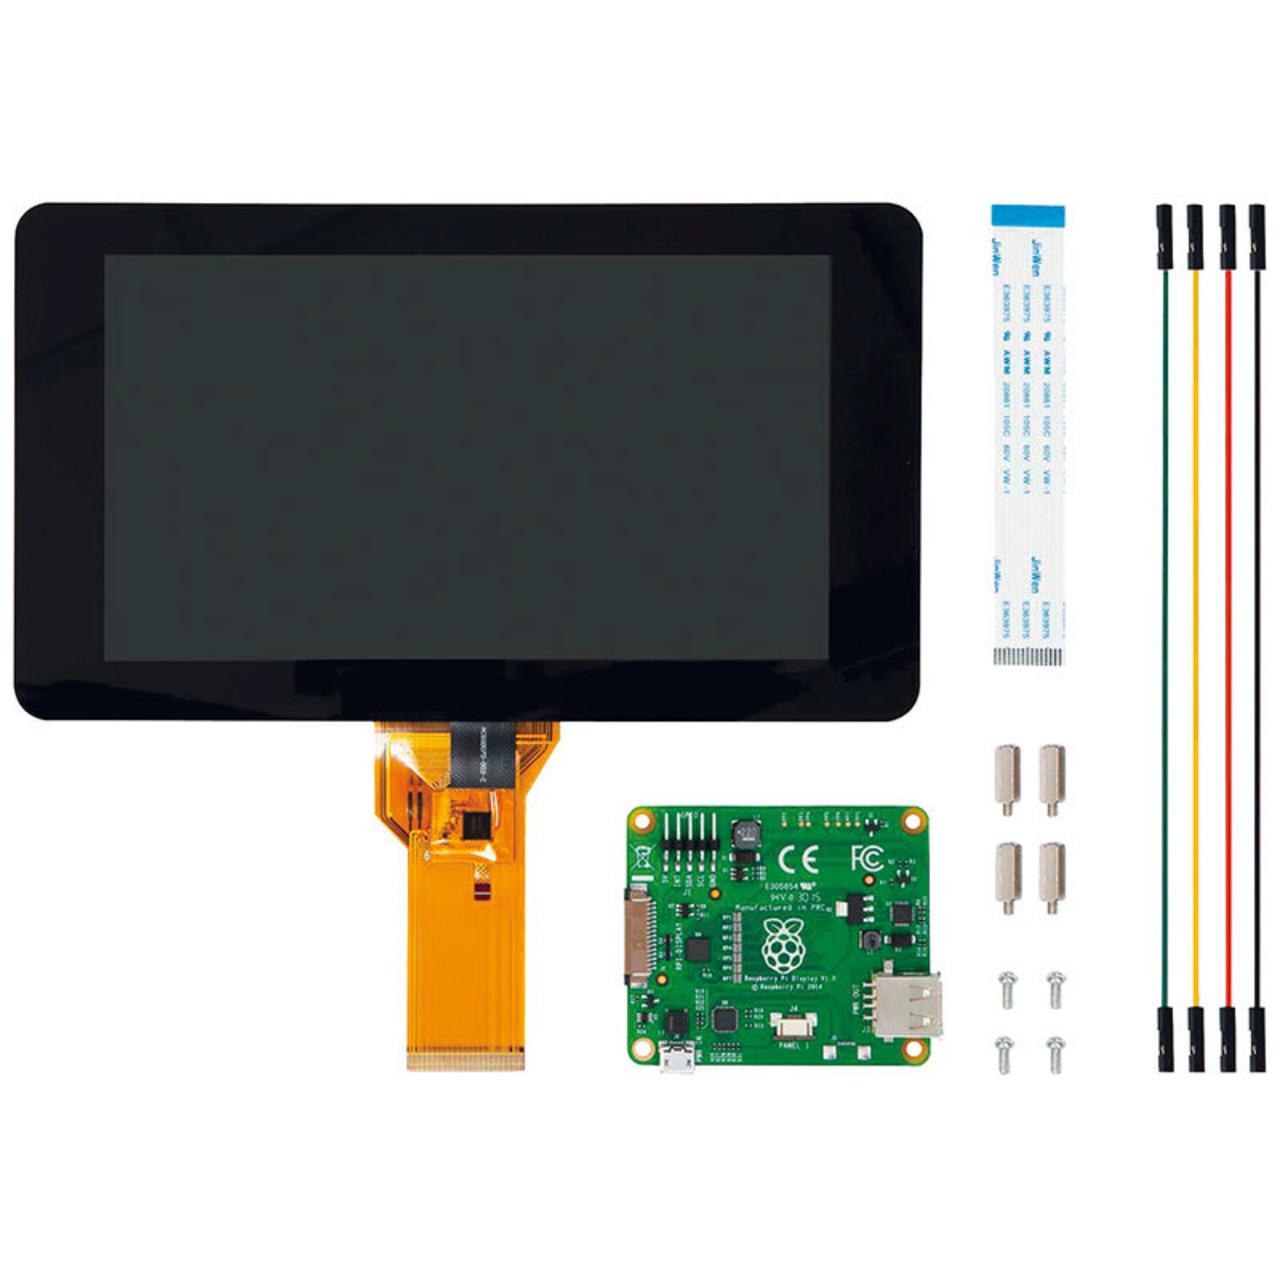 Raspberry Pi Touchscreen-Display 17-78 cm (7 Zoll)